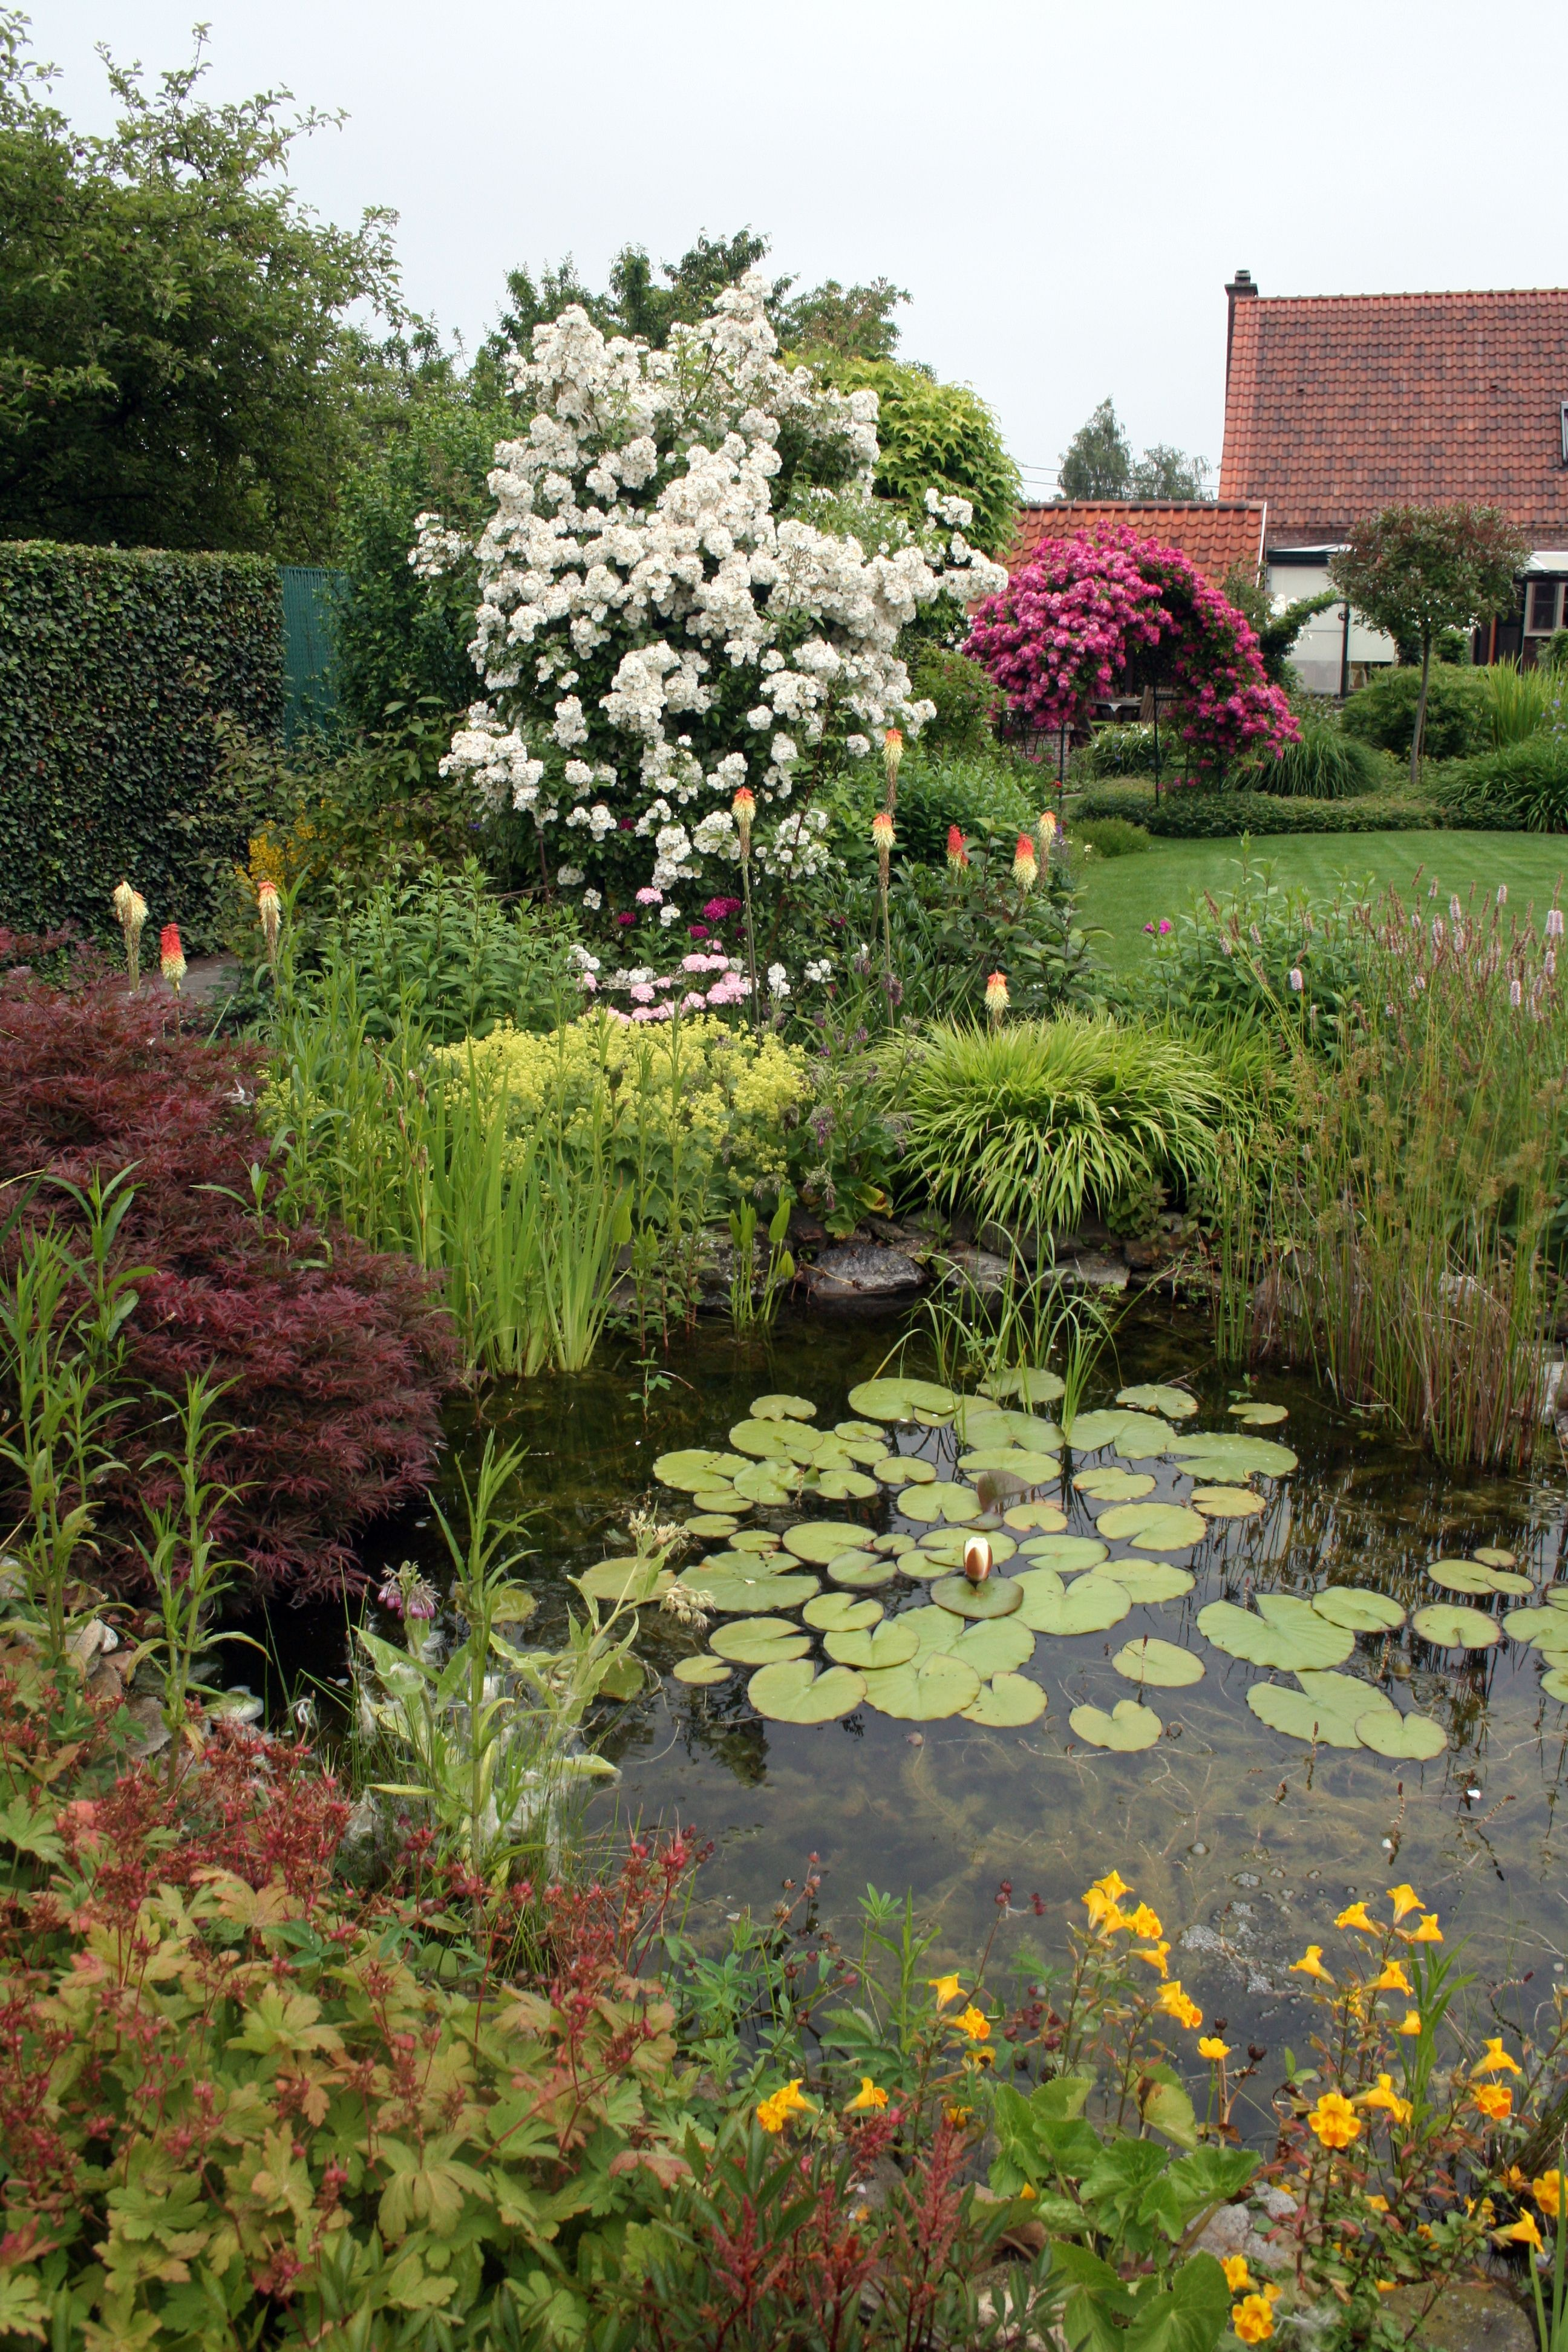 Pool Wasser Im Garten Bepflanzung Rose Graser Fackrllilie Gartenreise Belgien Holland Plants Outdoor Outdoor Decor